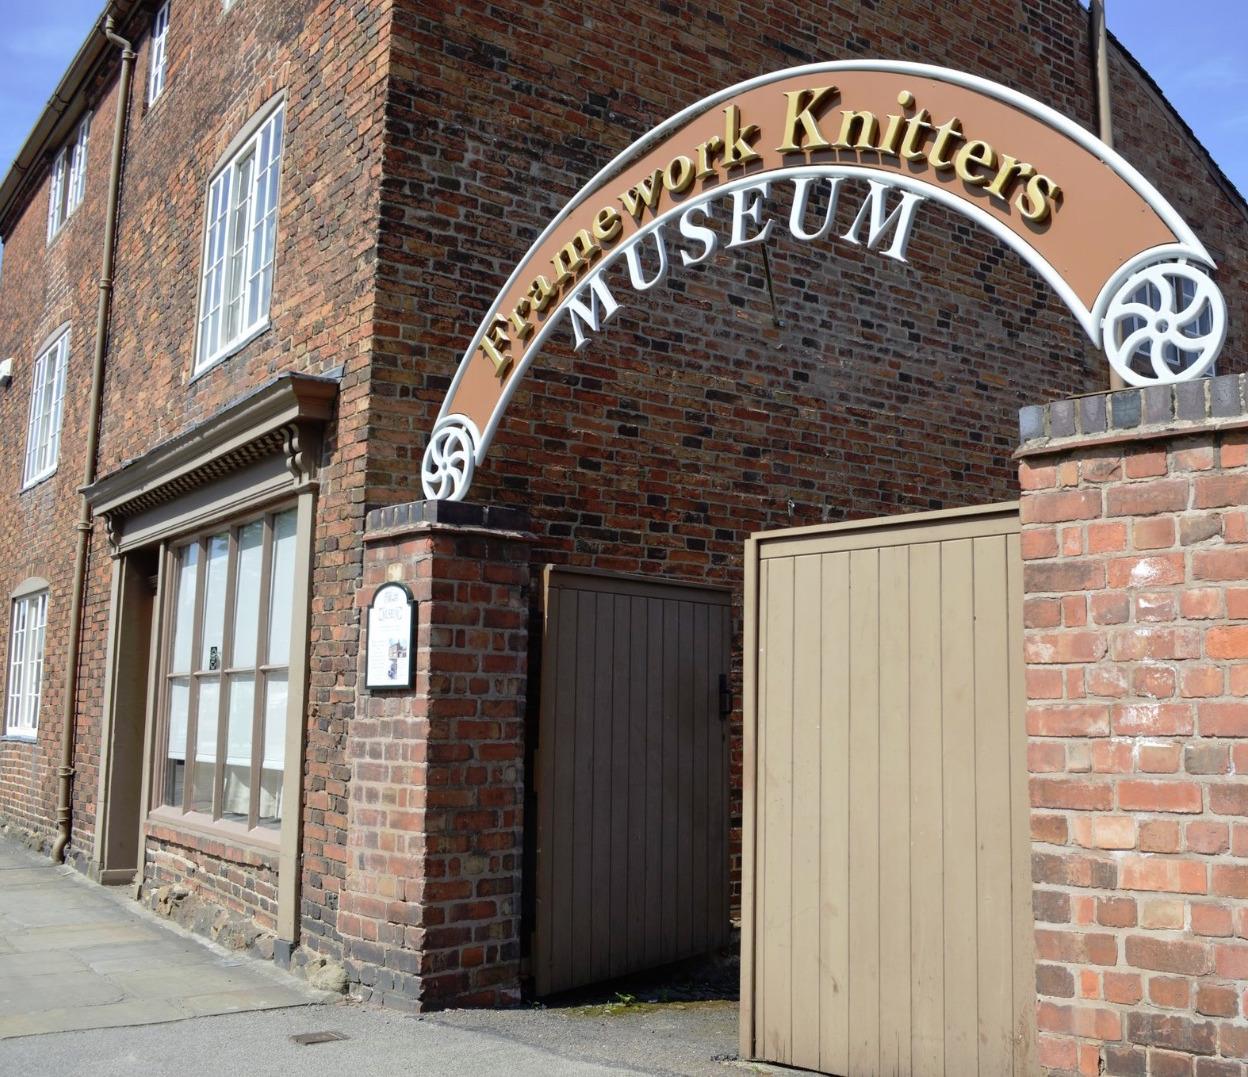 Framework Knitters Museum